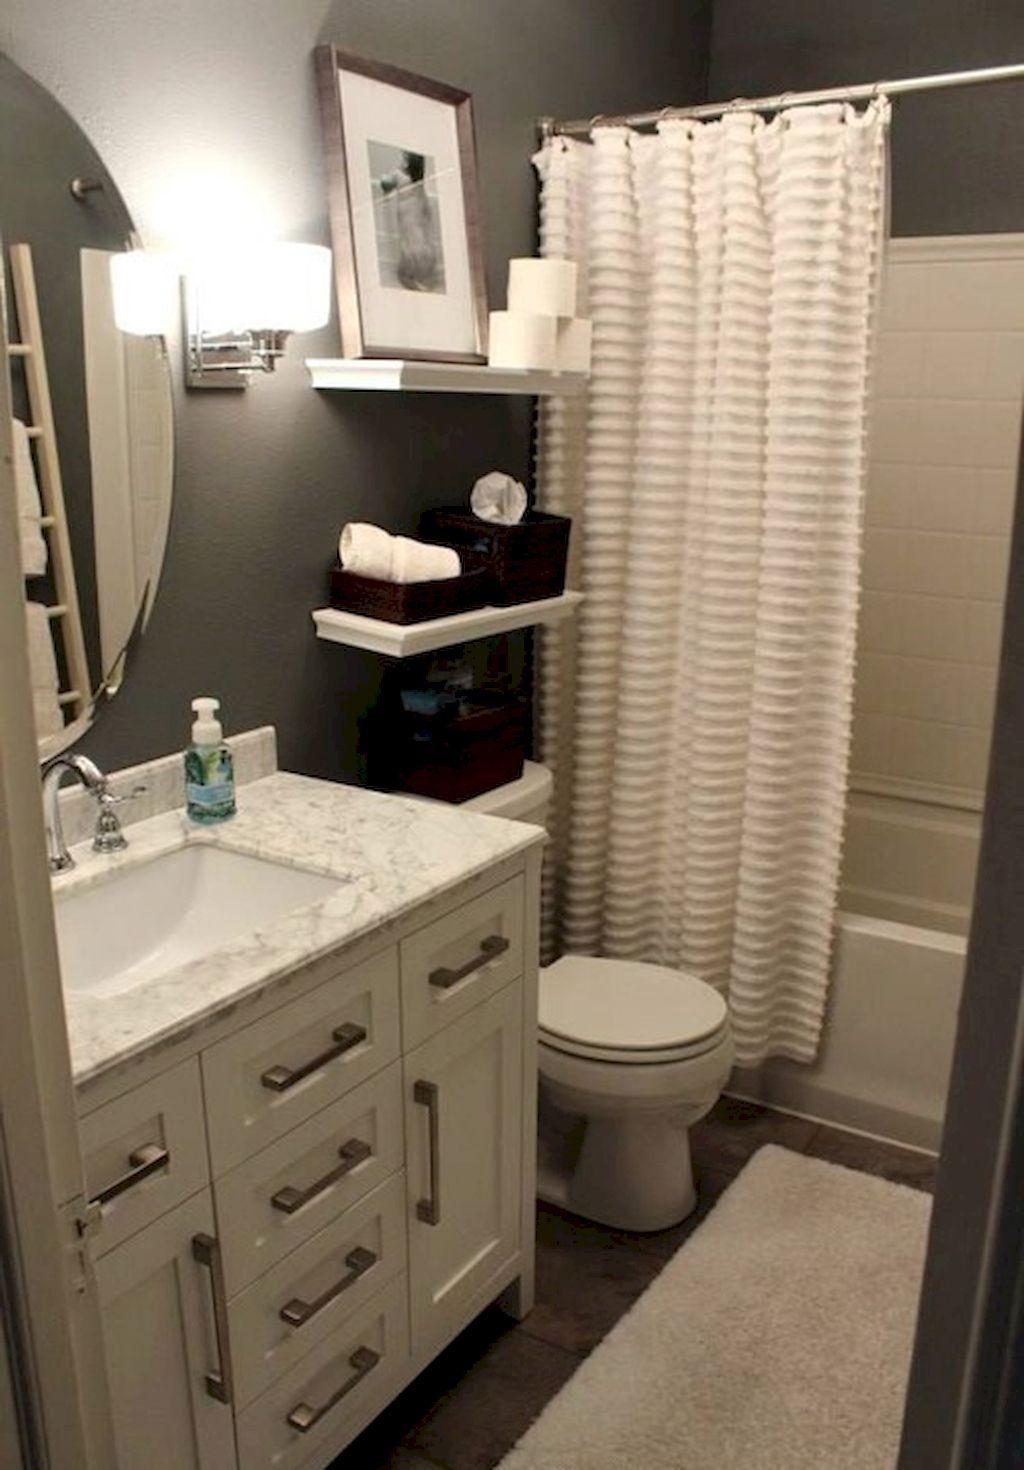 Small Bathroom Designs On A Budget 40 Fresh Small Master Bathroom Remodel Ideas On A Budget  Master